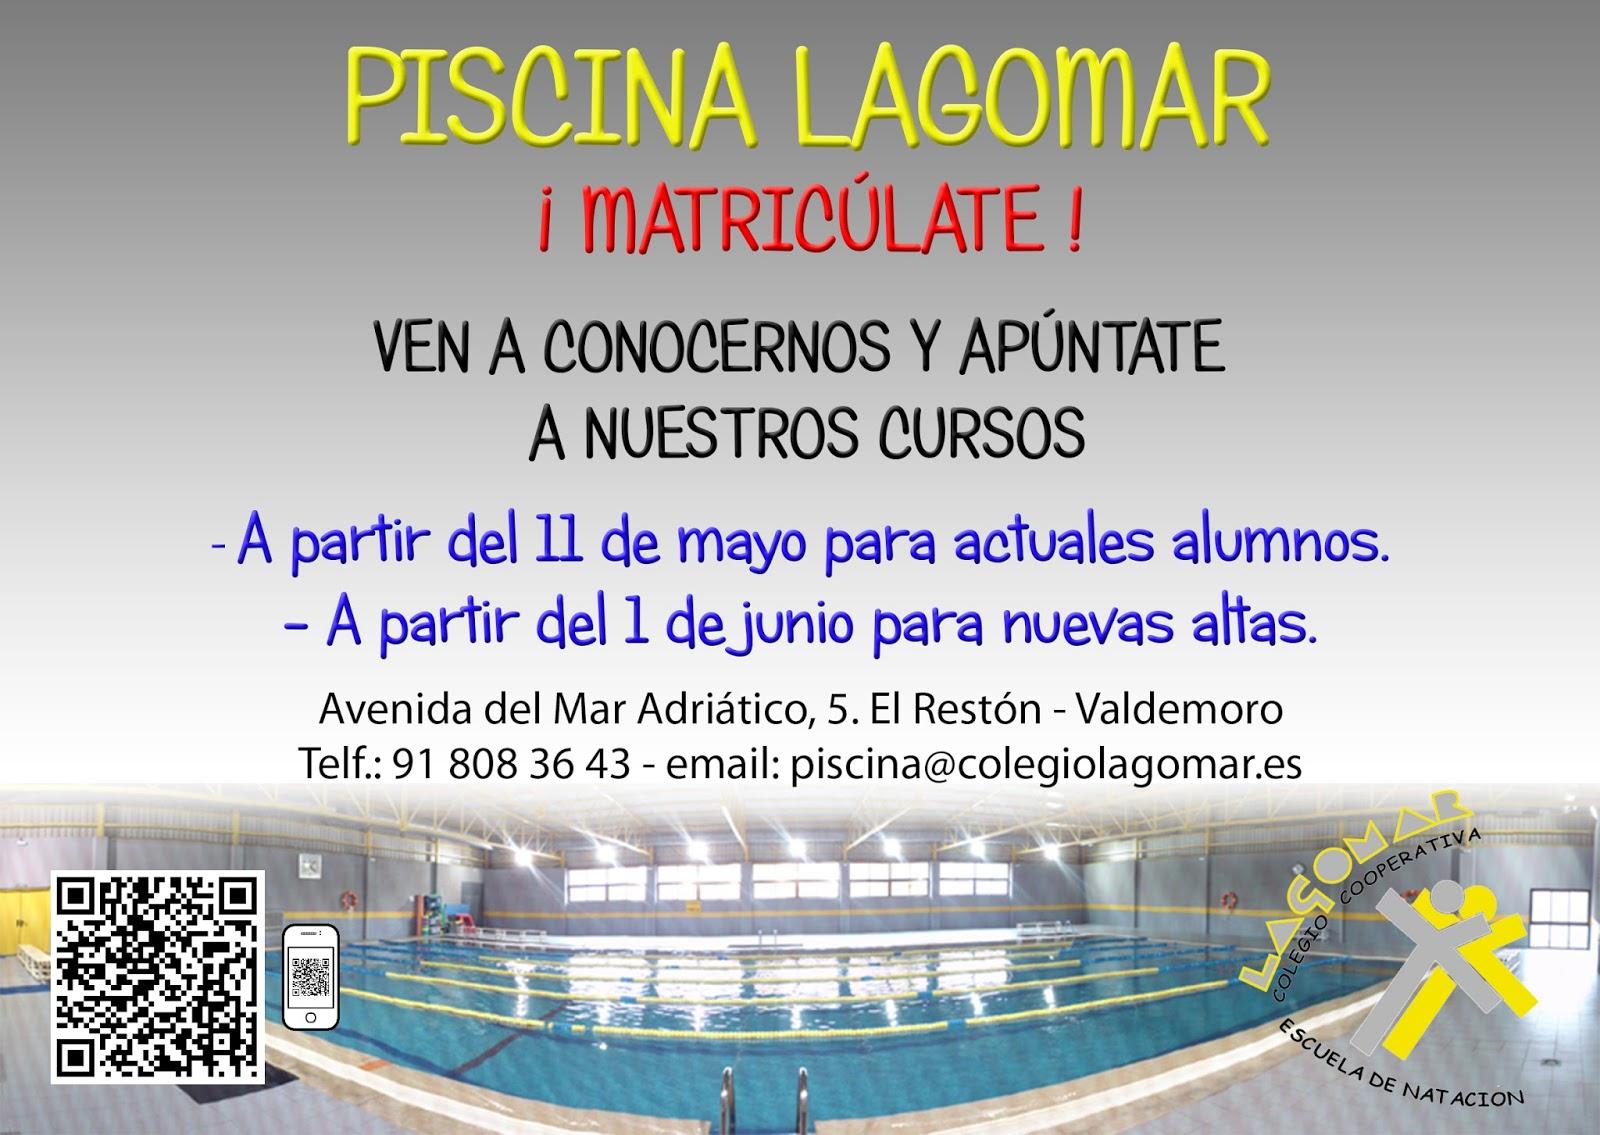 Piscina lagomar valdemoro cursos de nataci n - Piscina de valdemoro ...